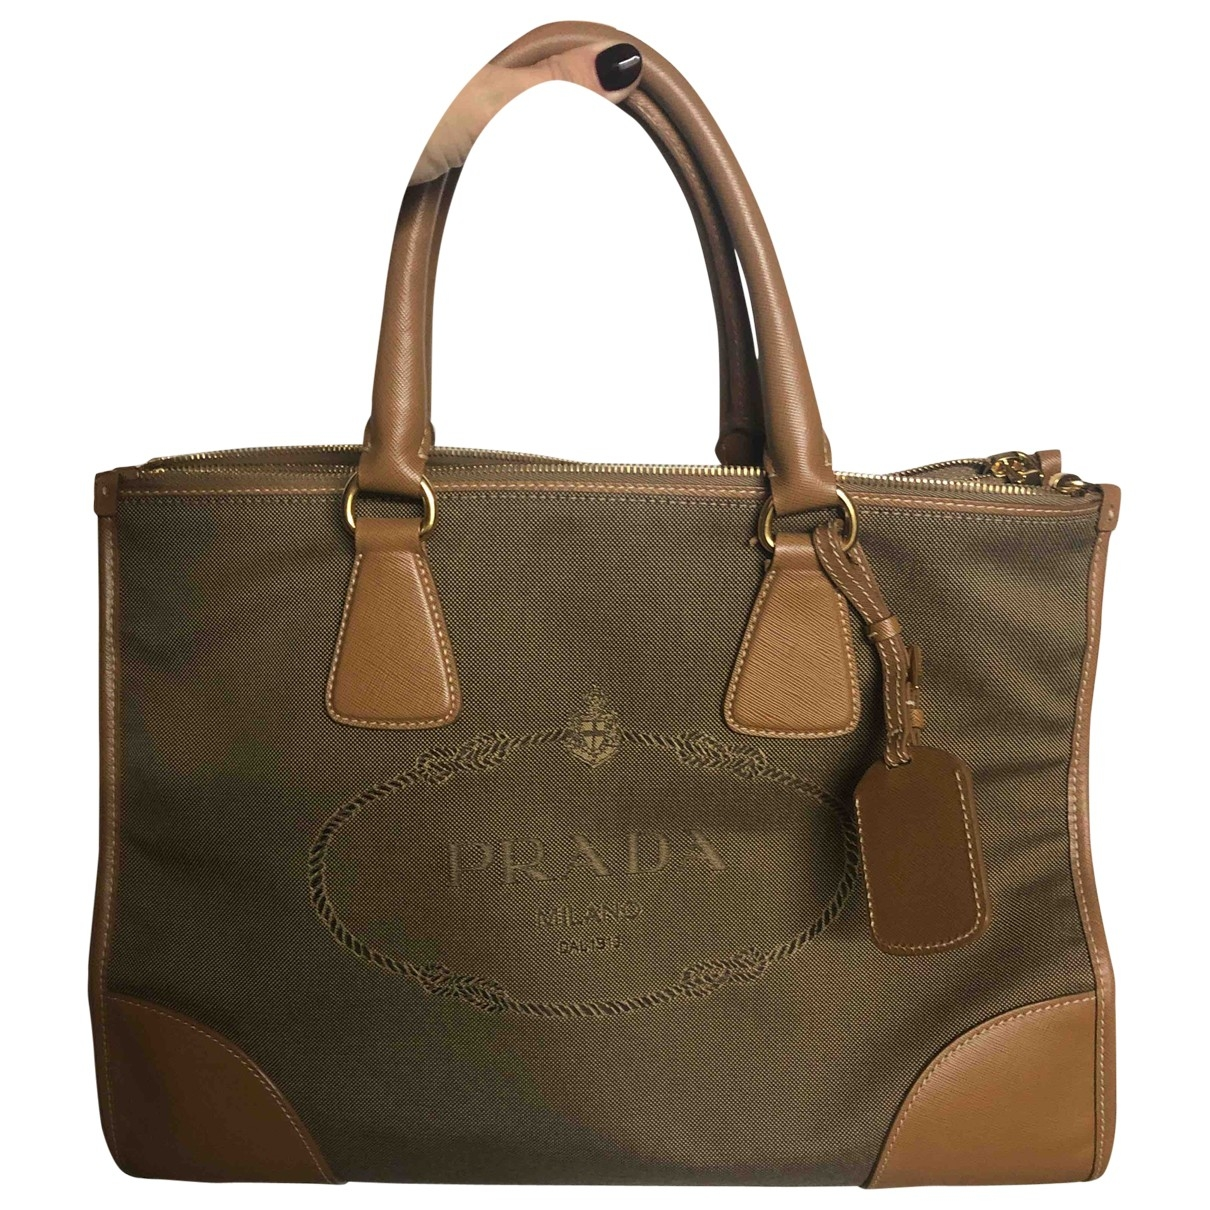 Prada \N Handtasche in  Kamel Leinen